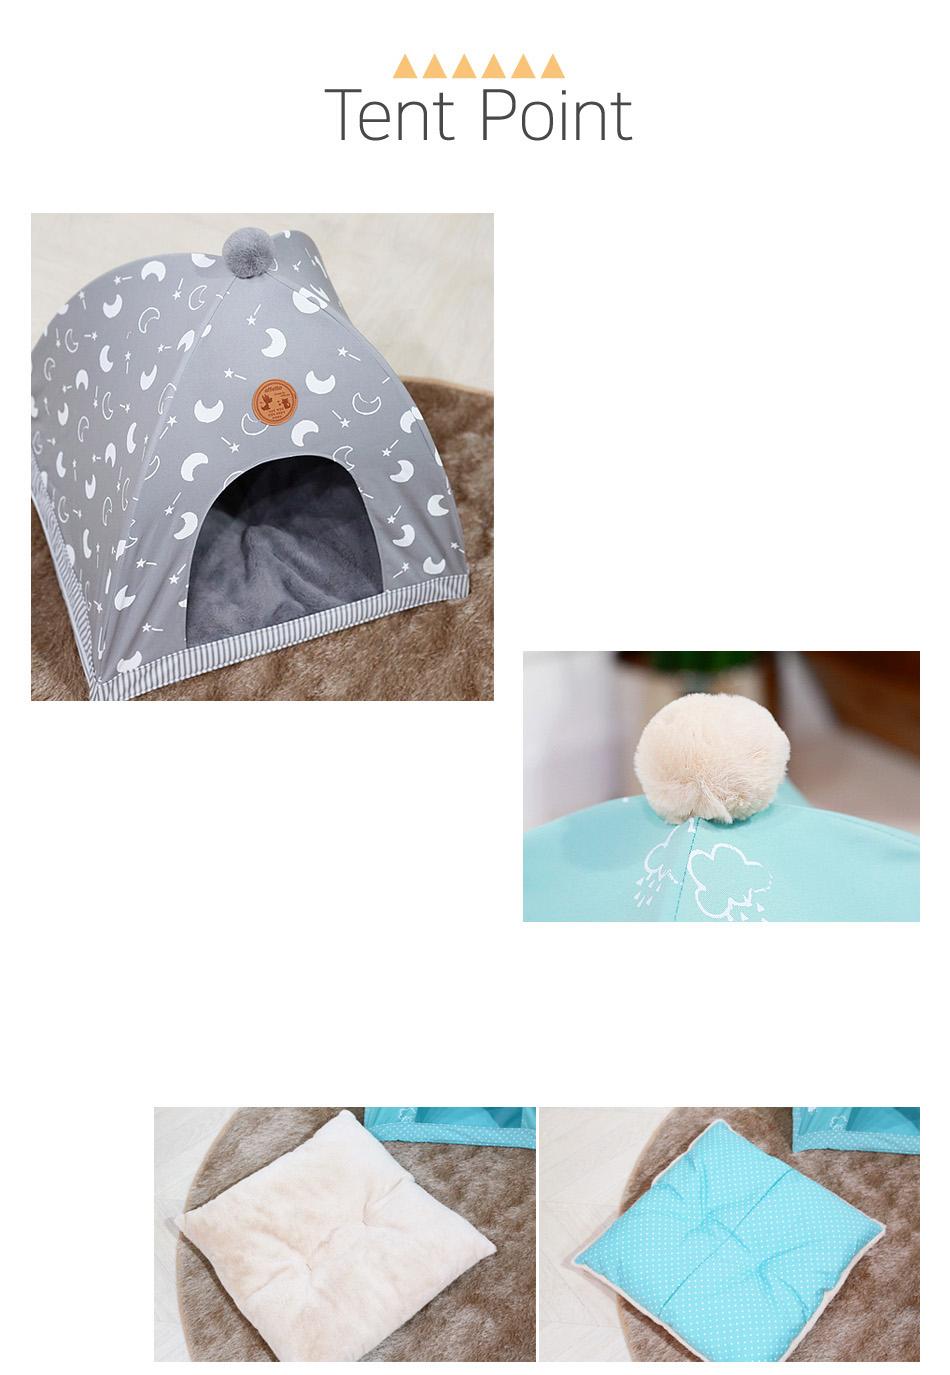 pop-tent-04.jpg